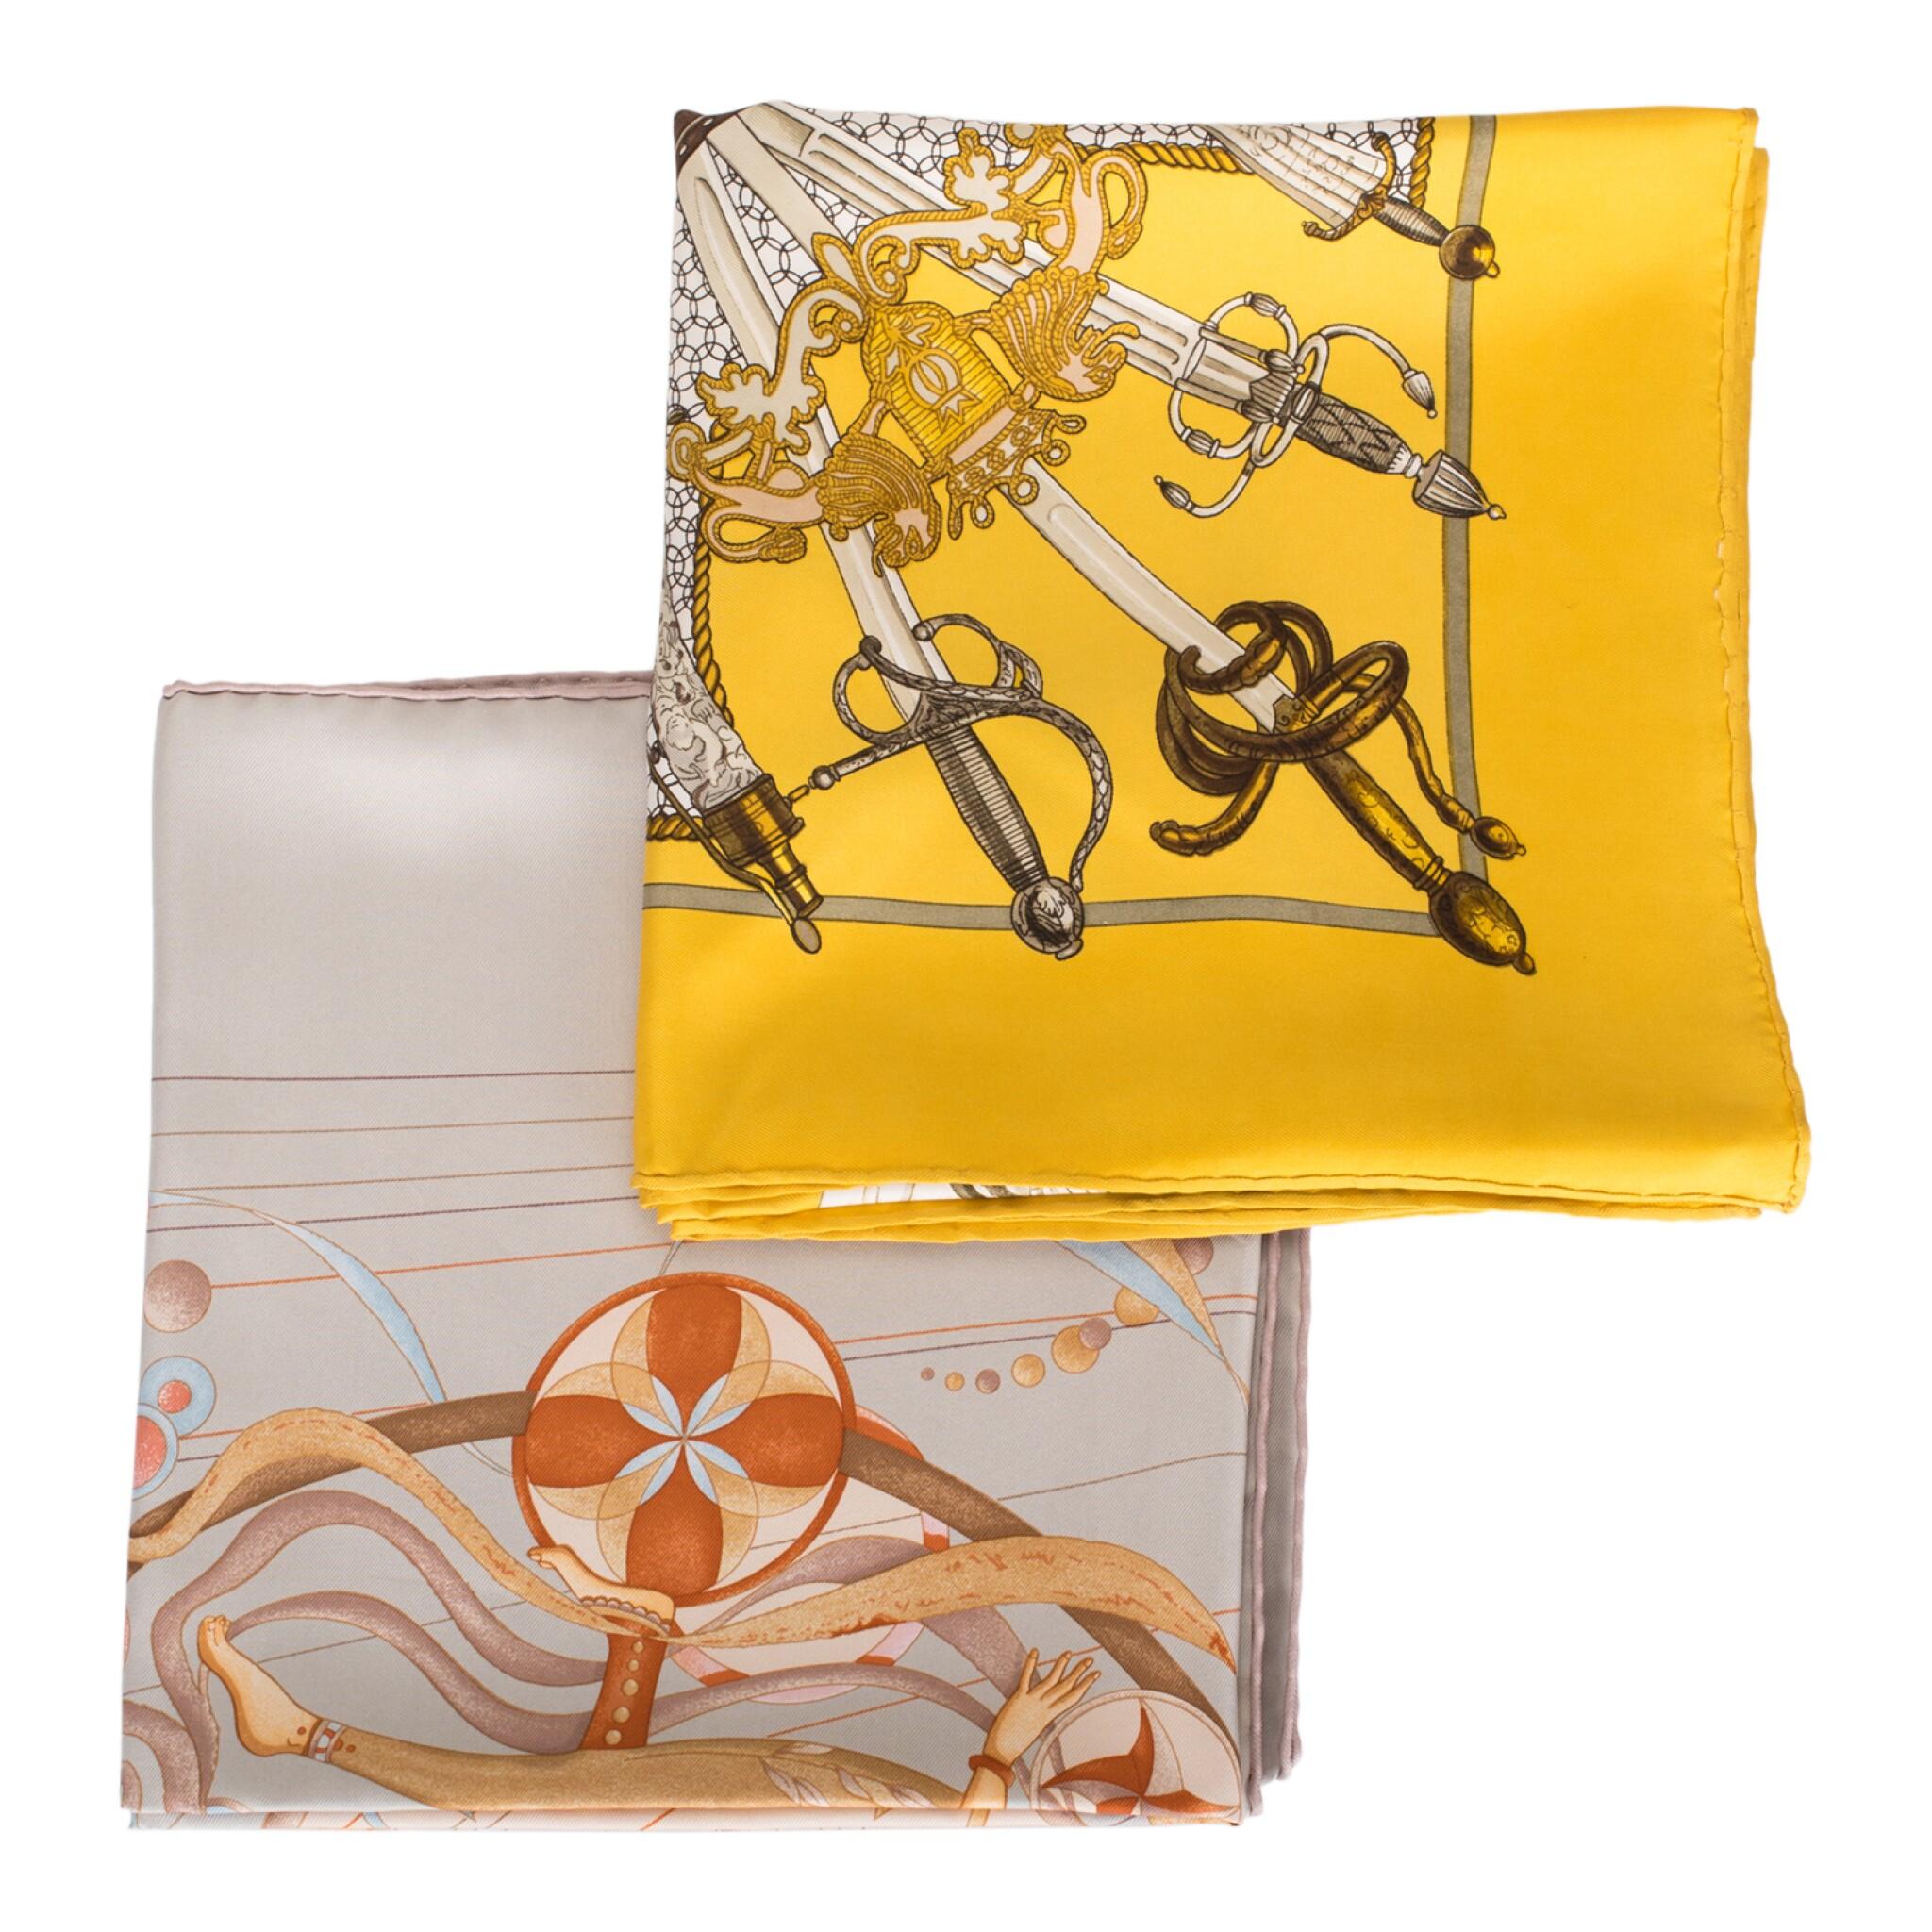 "View full screen - View 1 of Lot 98. Hermès Set of Two Scarves:""La Danse du Cosmos"" Silk Twill Scarf 90cm and ""Armeria"" Silk Twill 90cm."